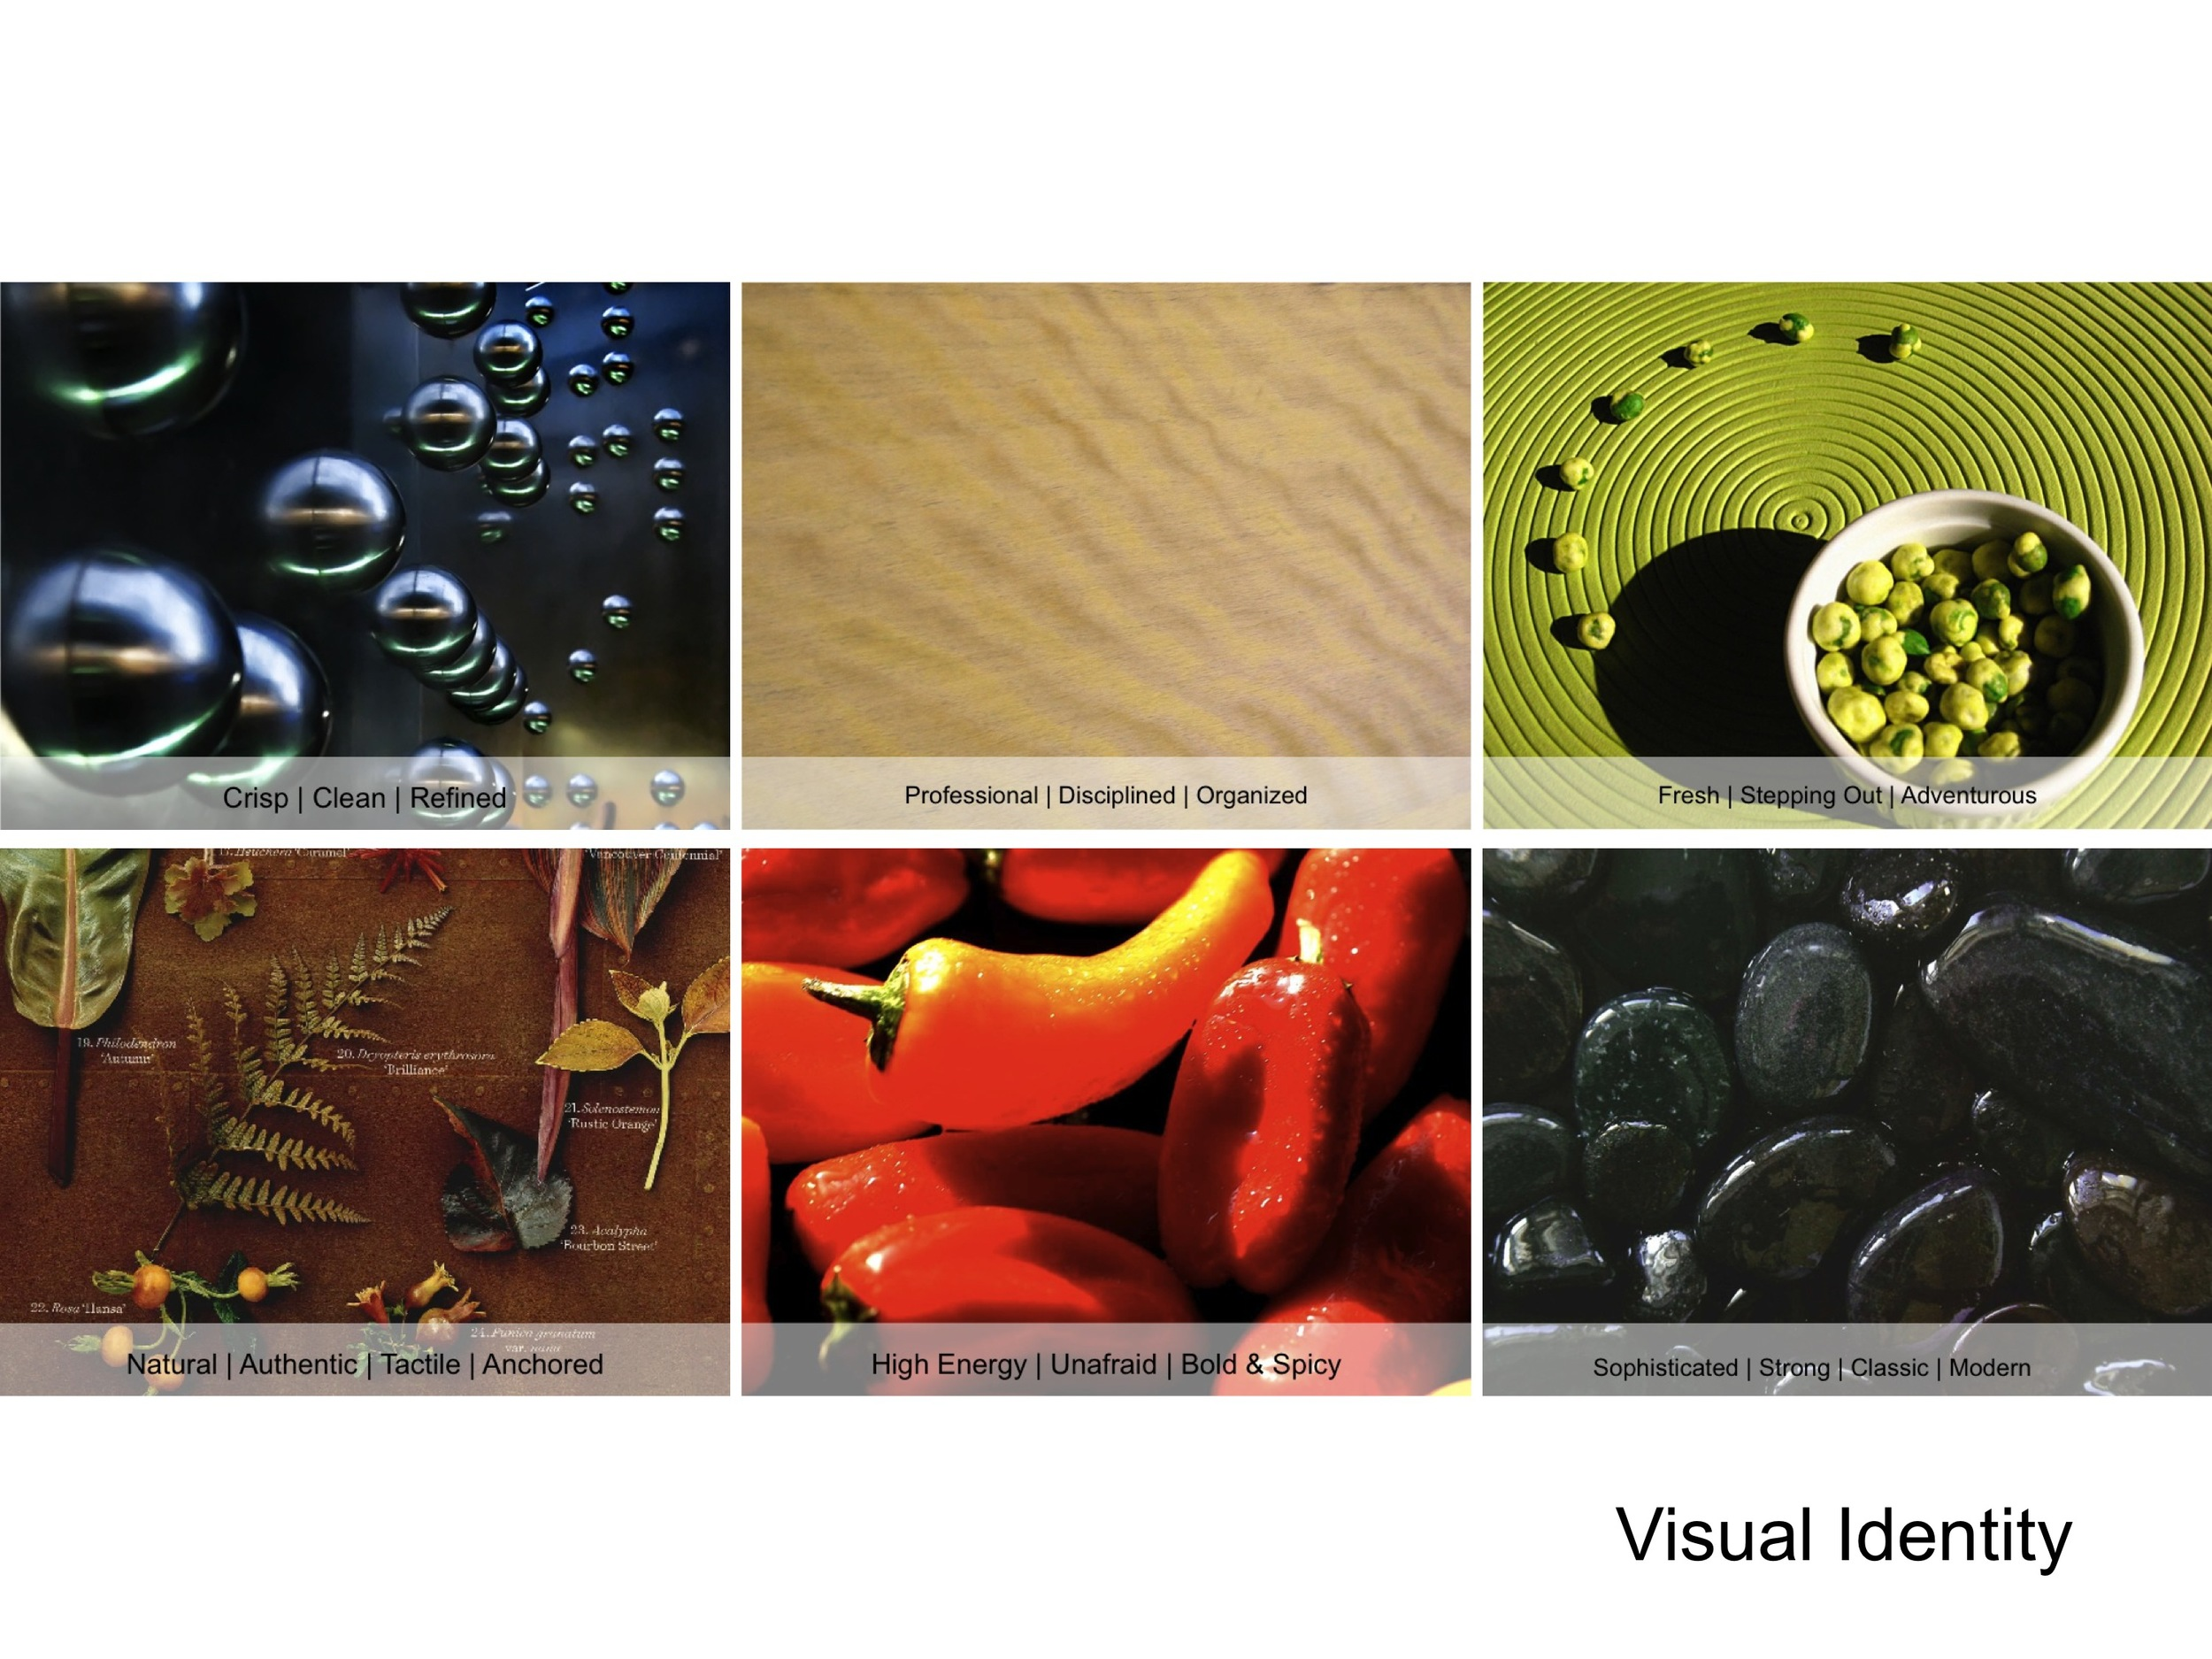 609-5_51_Arlie_Offices_Visual Identity.jpg